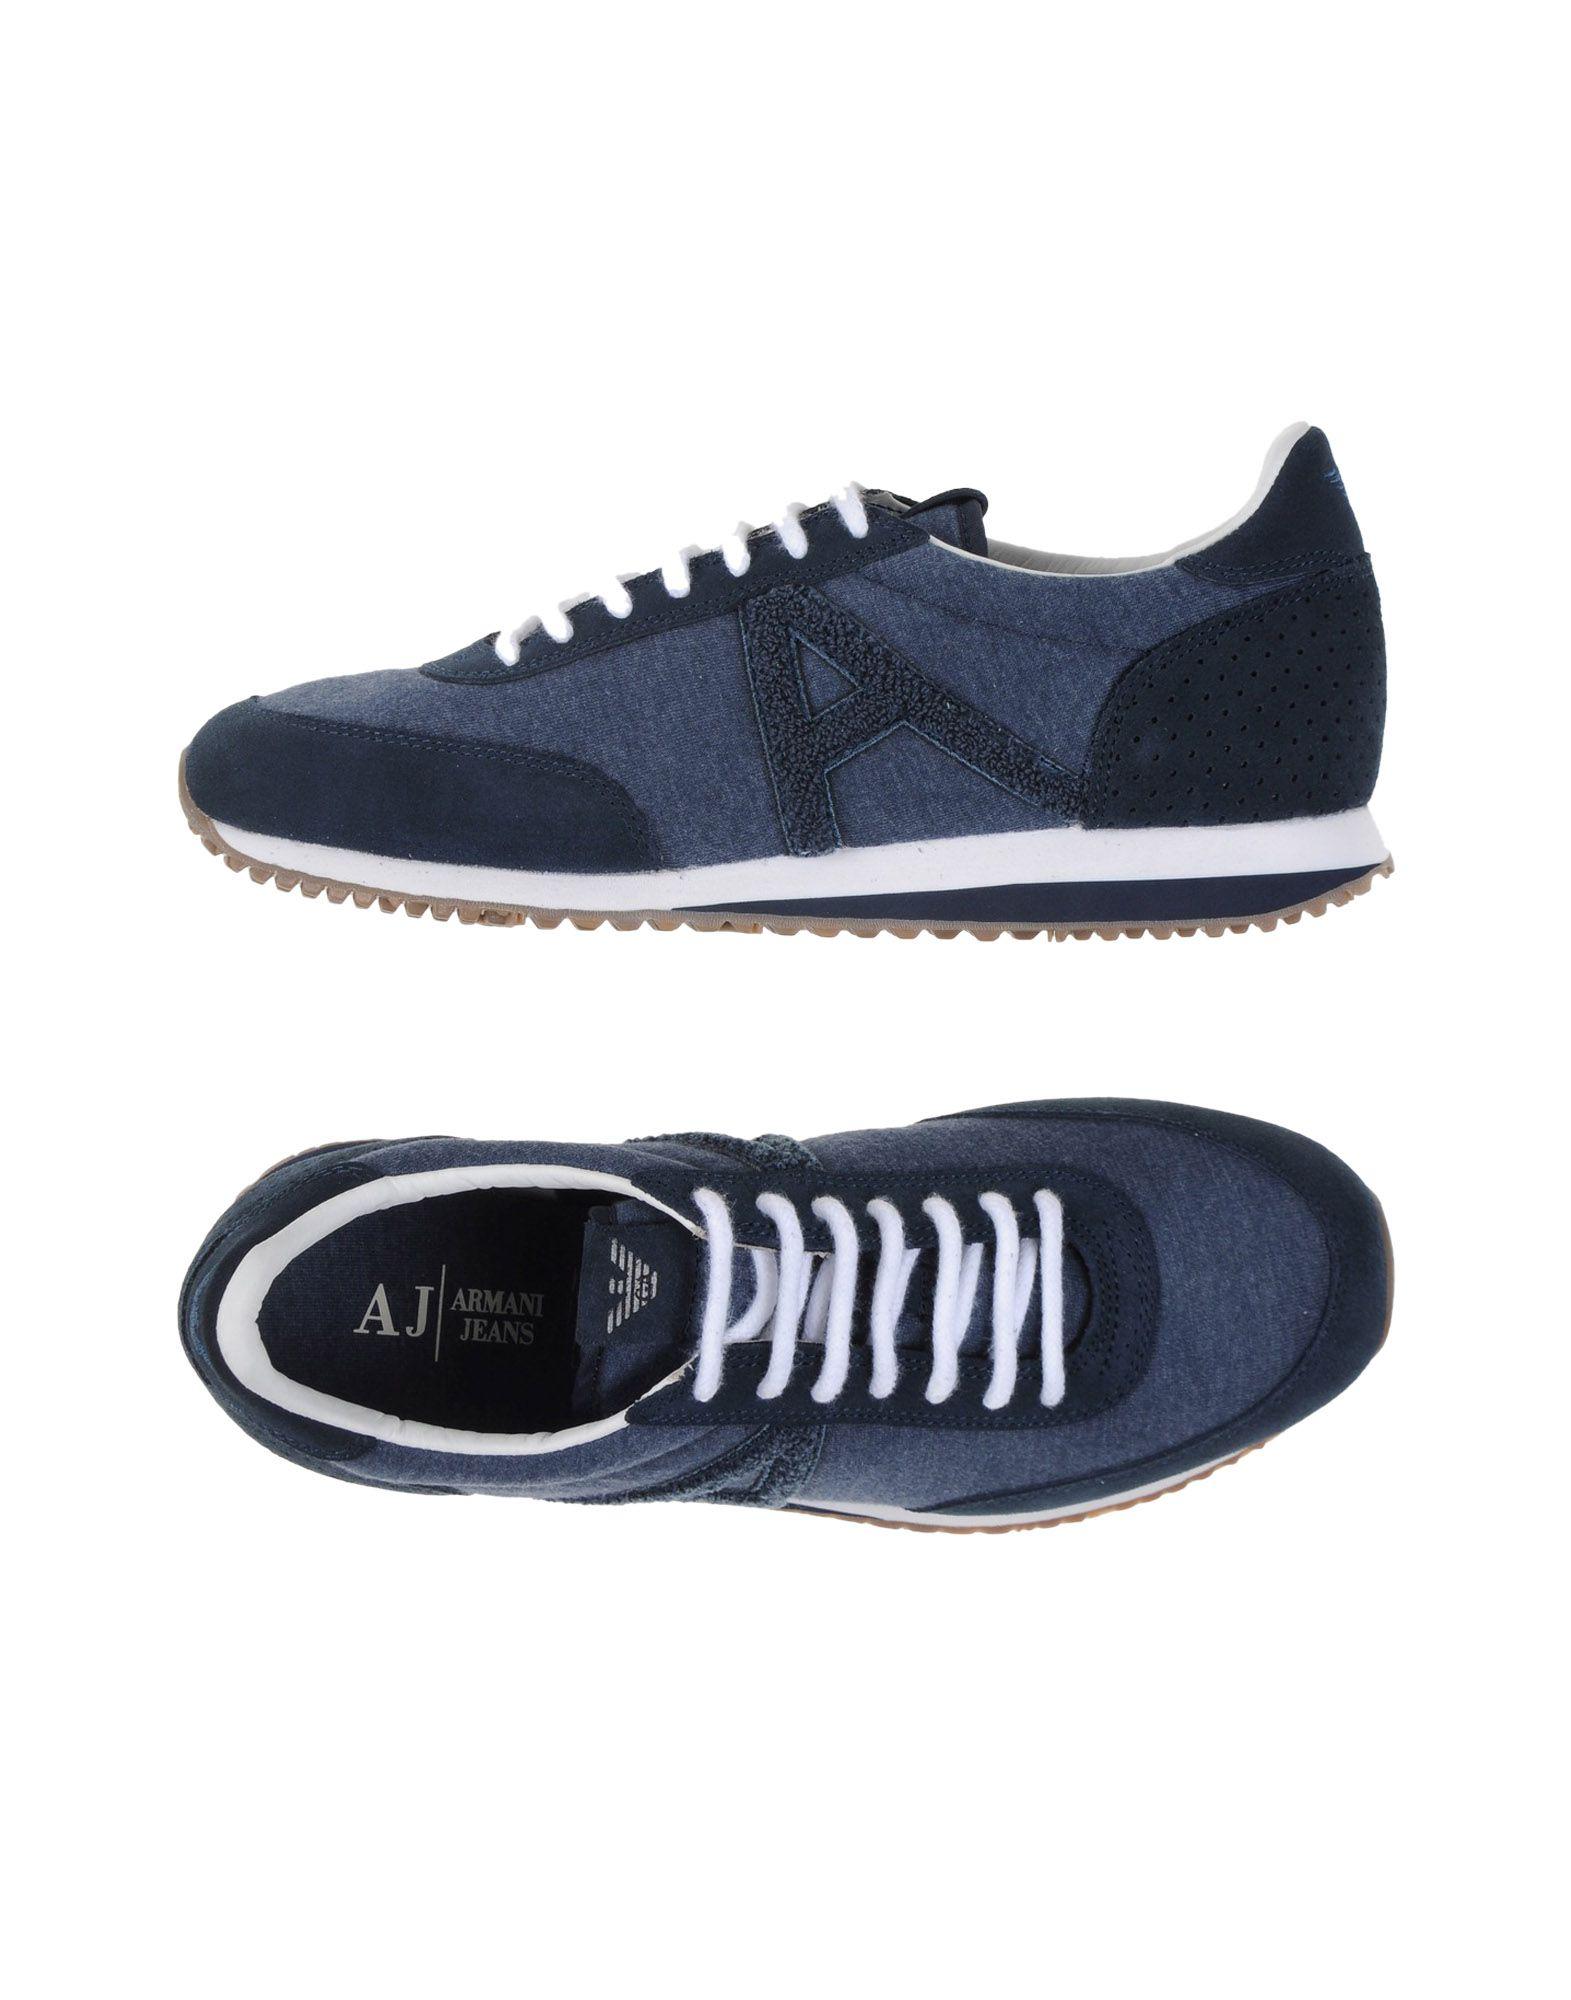 chaussure armani jeans homme soldes 1 25c09abea16